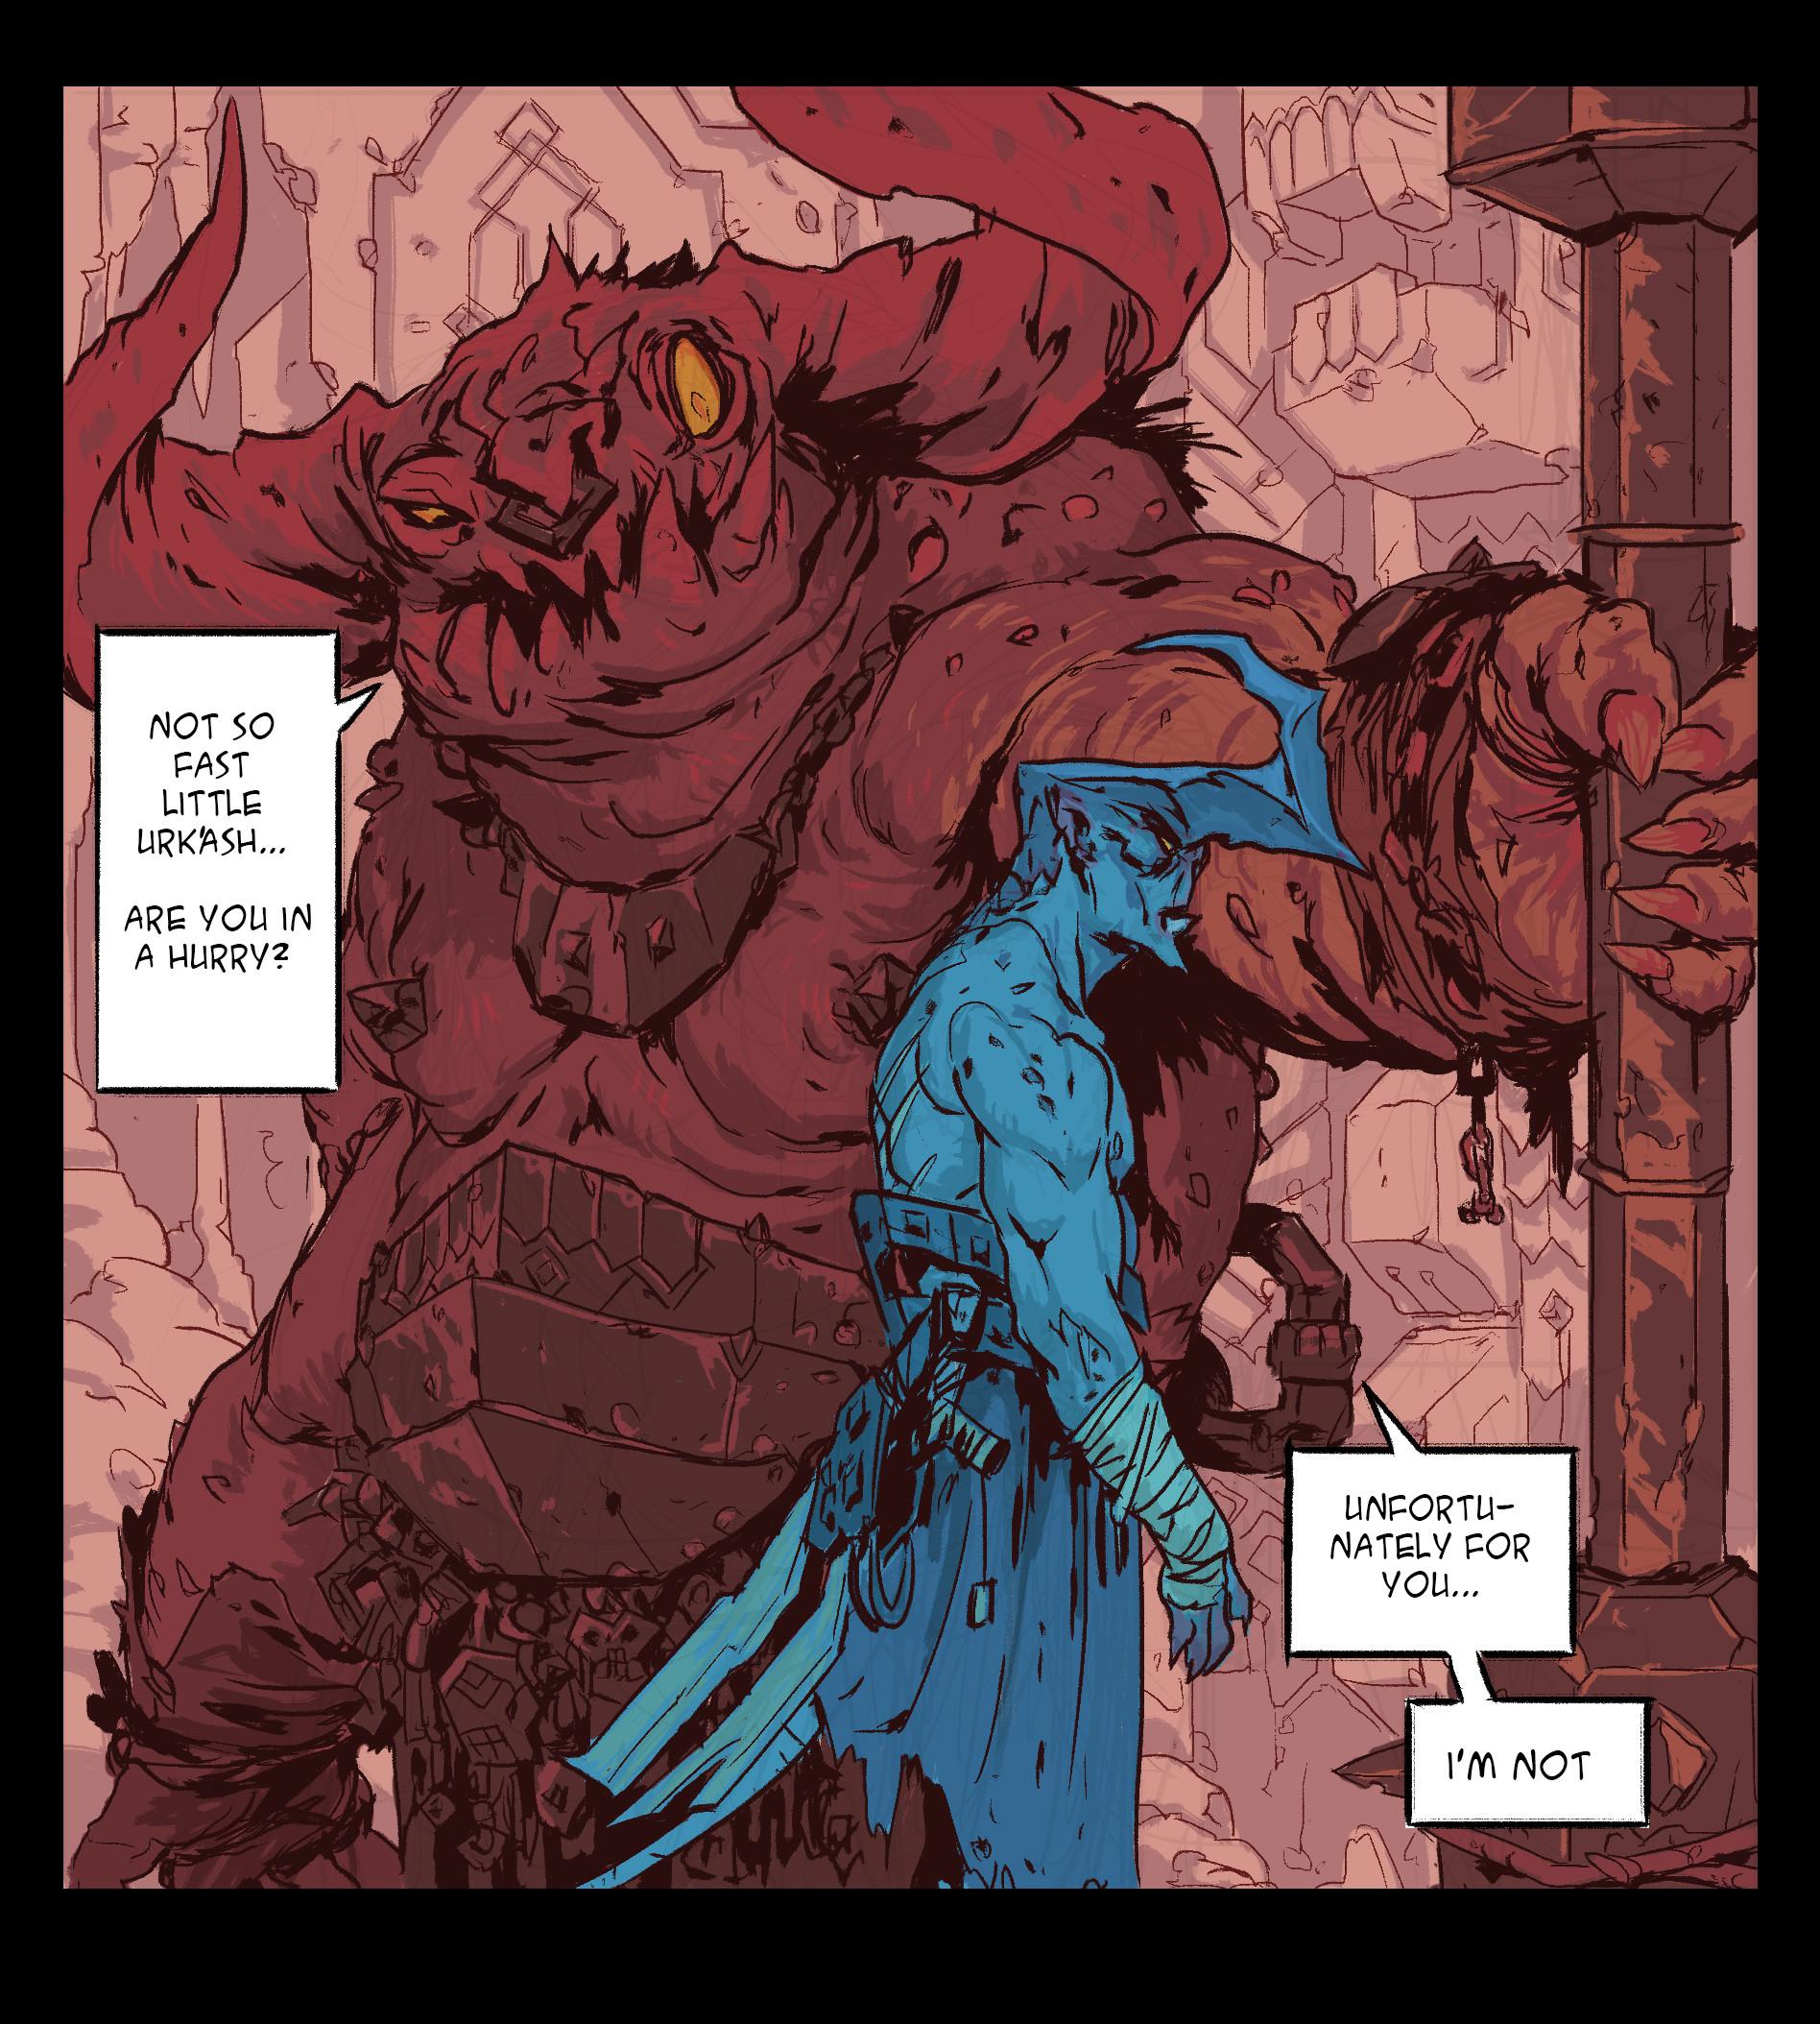 Xabier urrutia comicstyle5